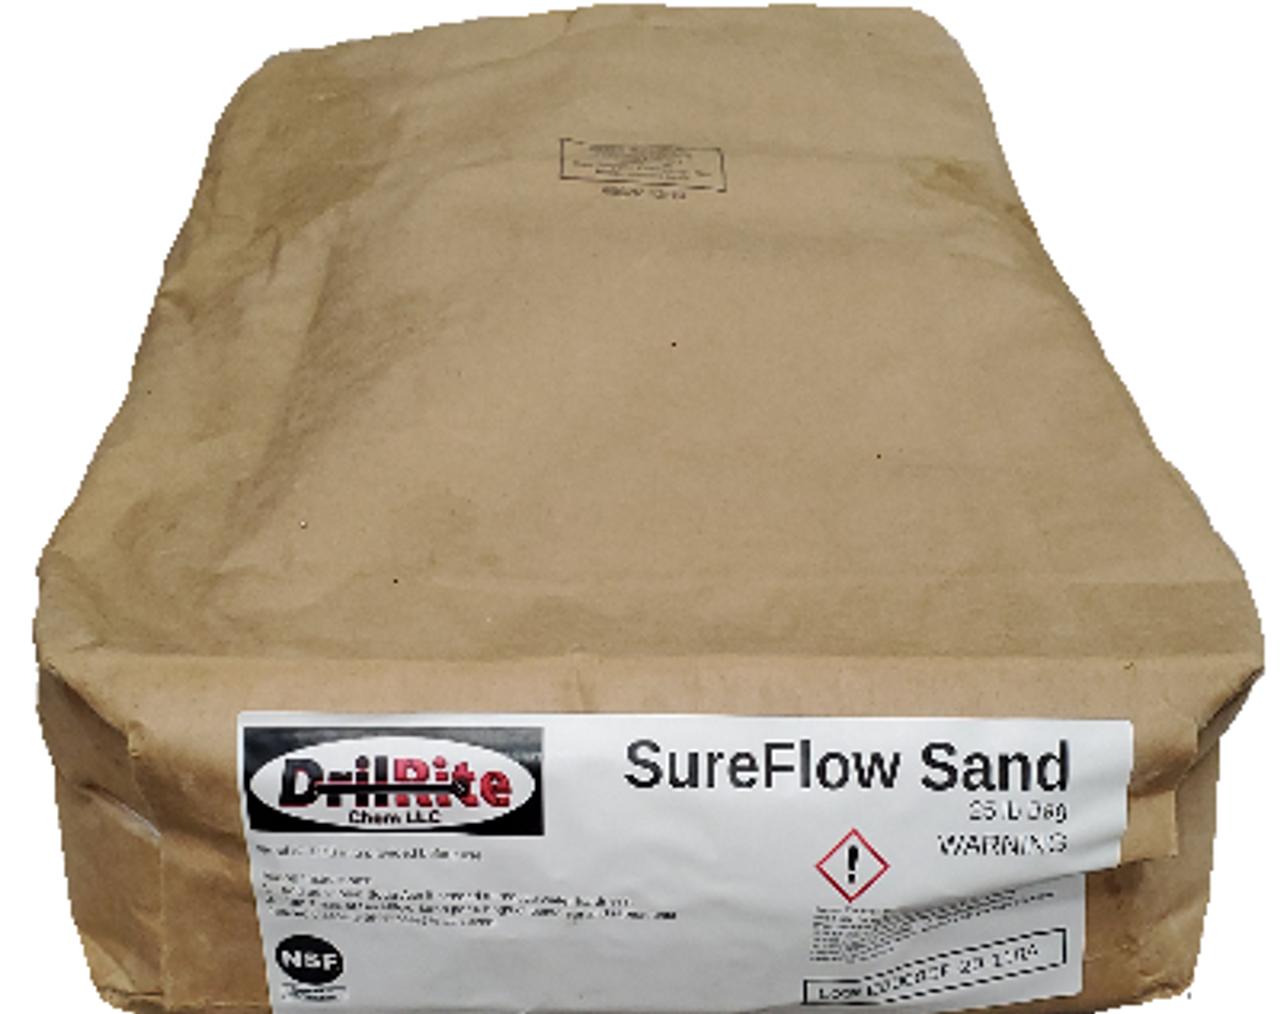 SureFlow Sand 25 lb. Bag